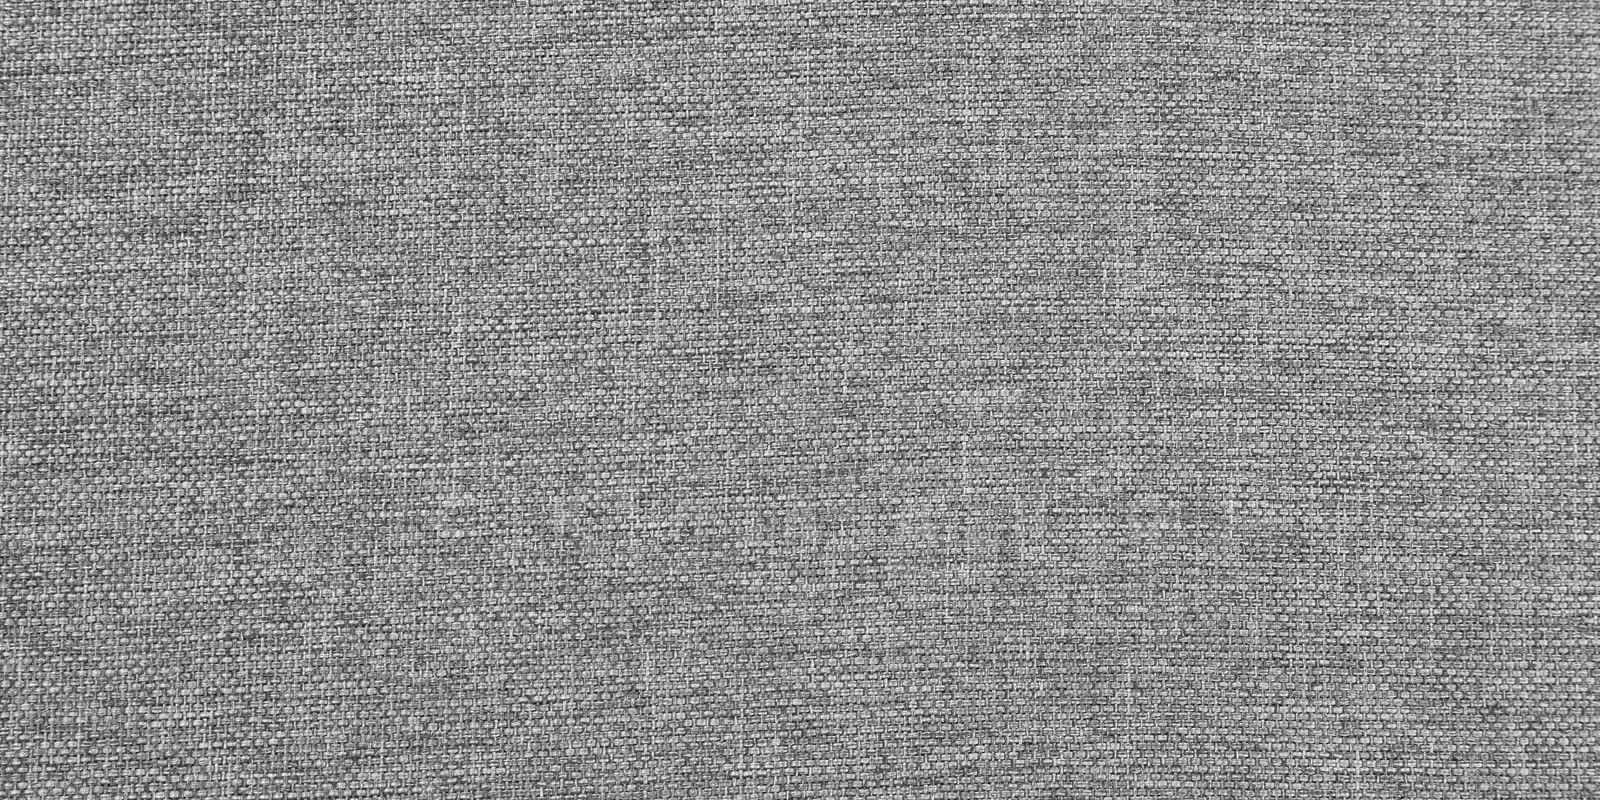 Диван Флэтфорд рогожка серый цвет фото 8 | интернет-магазин Складно